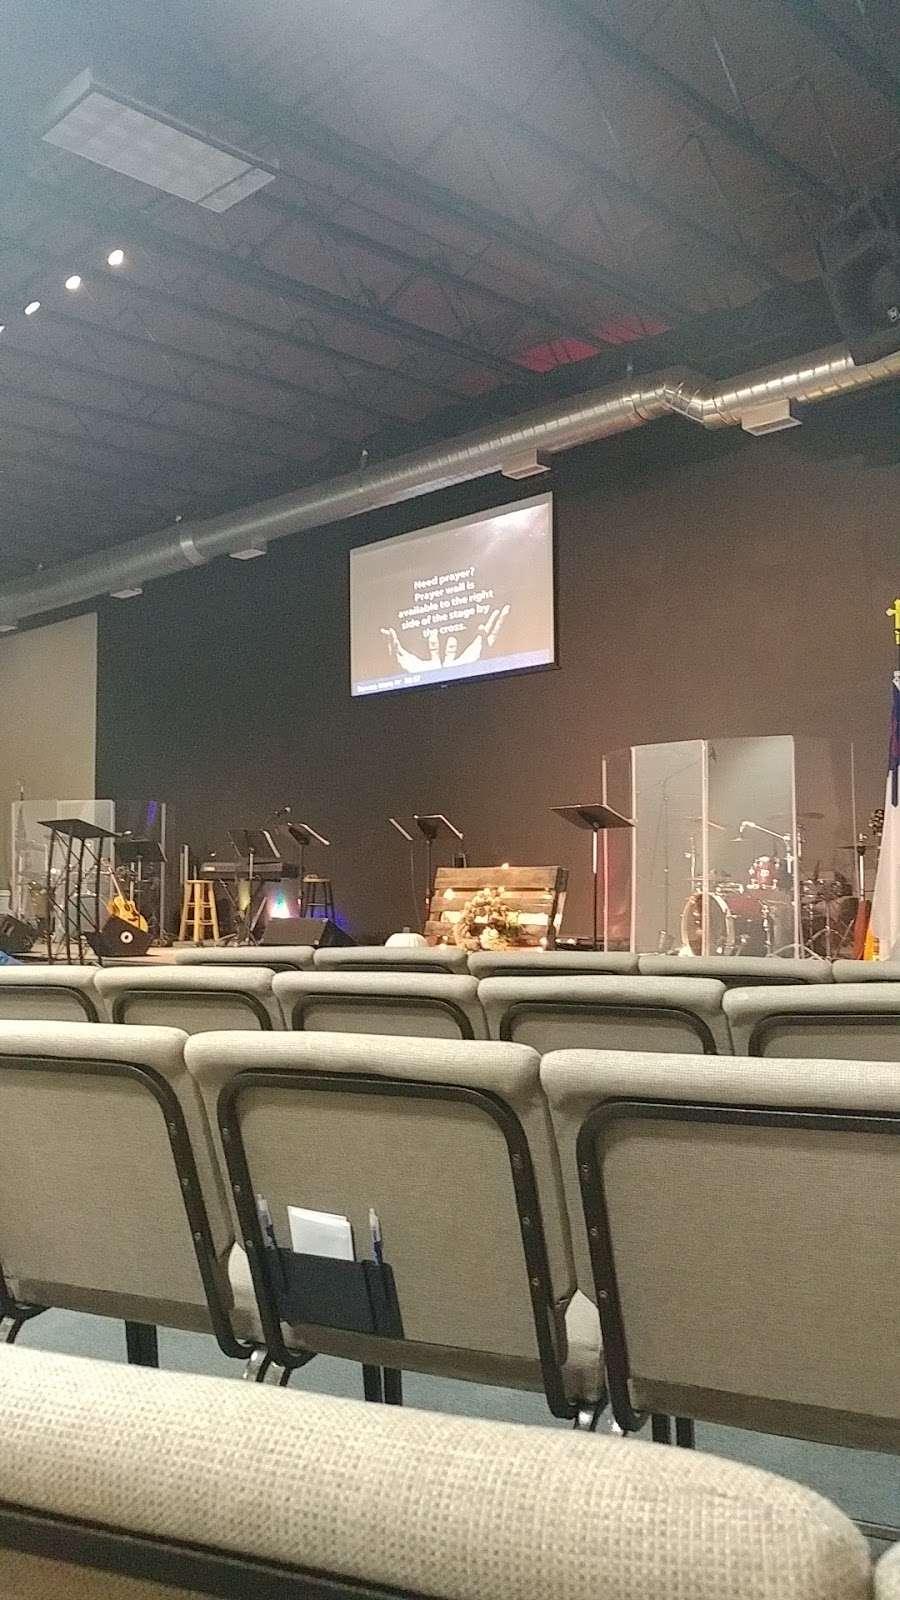 Life Spring Church - church  | Photo 6 of 10 | Address: 12336 W Butler Dr #200, El Mirage, AZ 85335, USA | Phone: (623) 935-3202